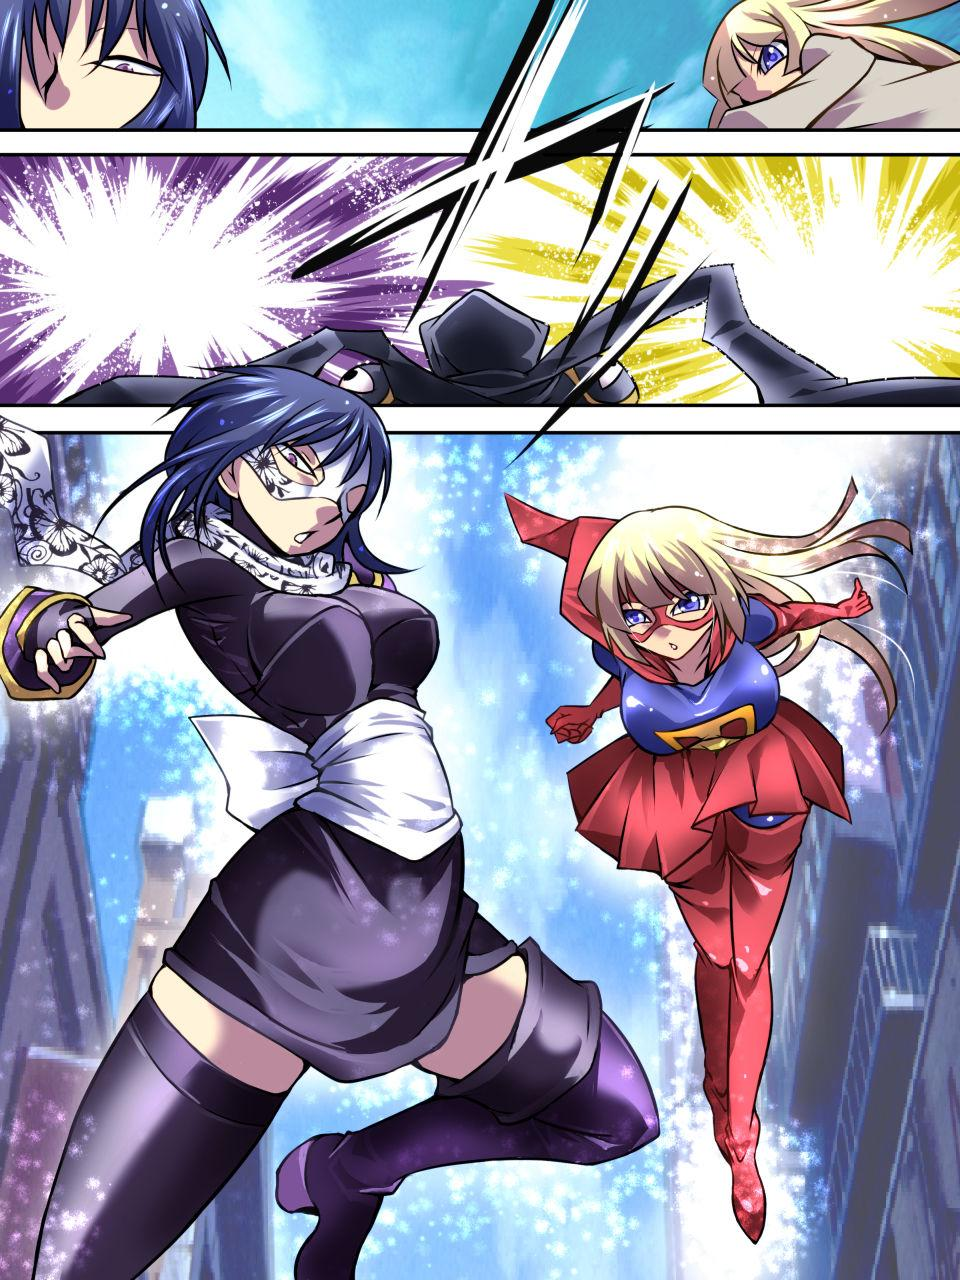 [Atelier Hachifukuan] Superheroine Yuukai Ryoujoku IV - Superheroine in Distress - Kunoichi Suzushiro [English] [Harasho Project] 9